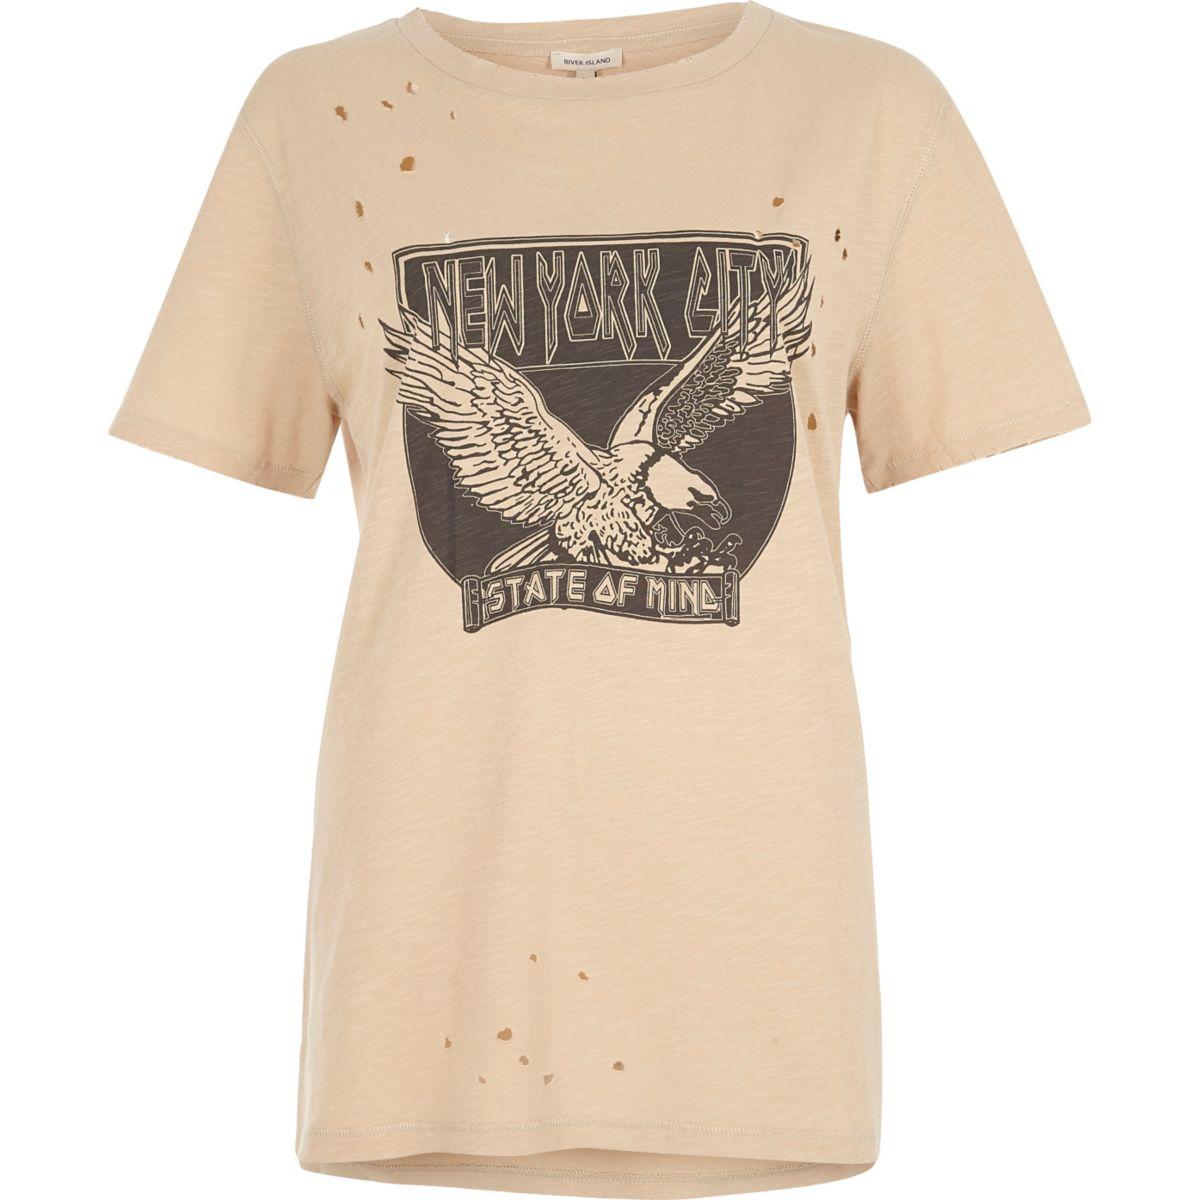 Beiges T-Shirt mit NYC-Print im Used-Look